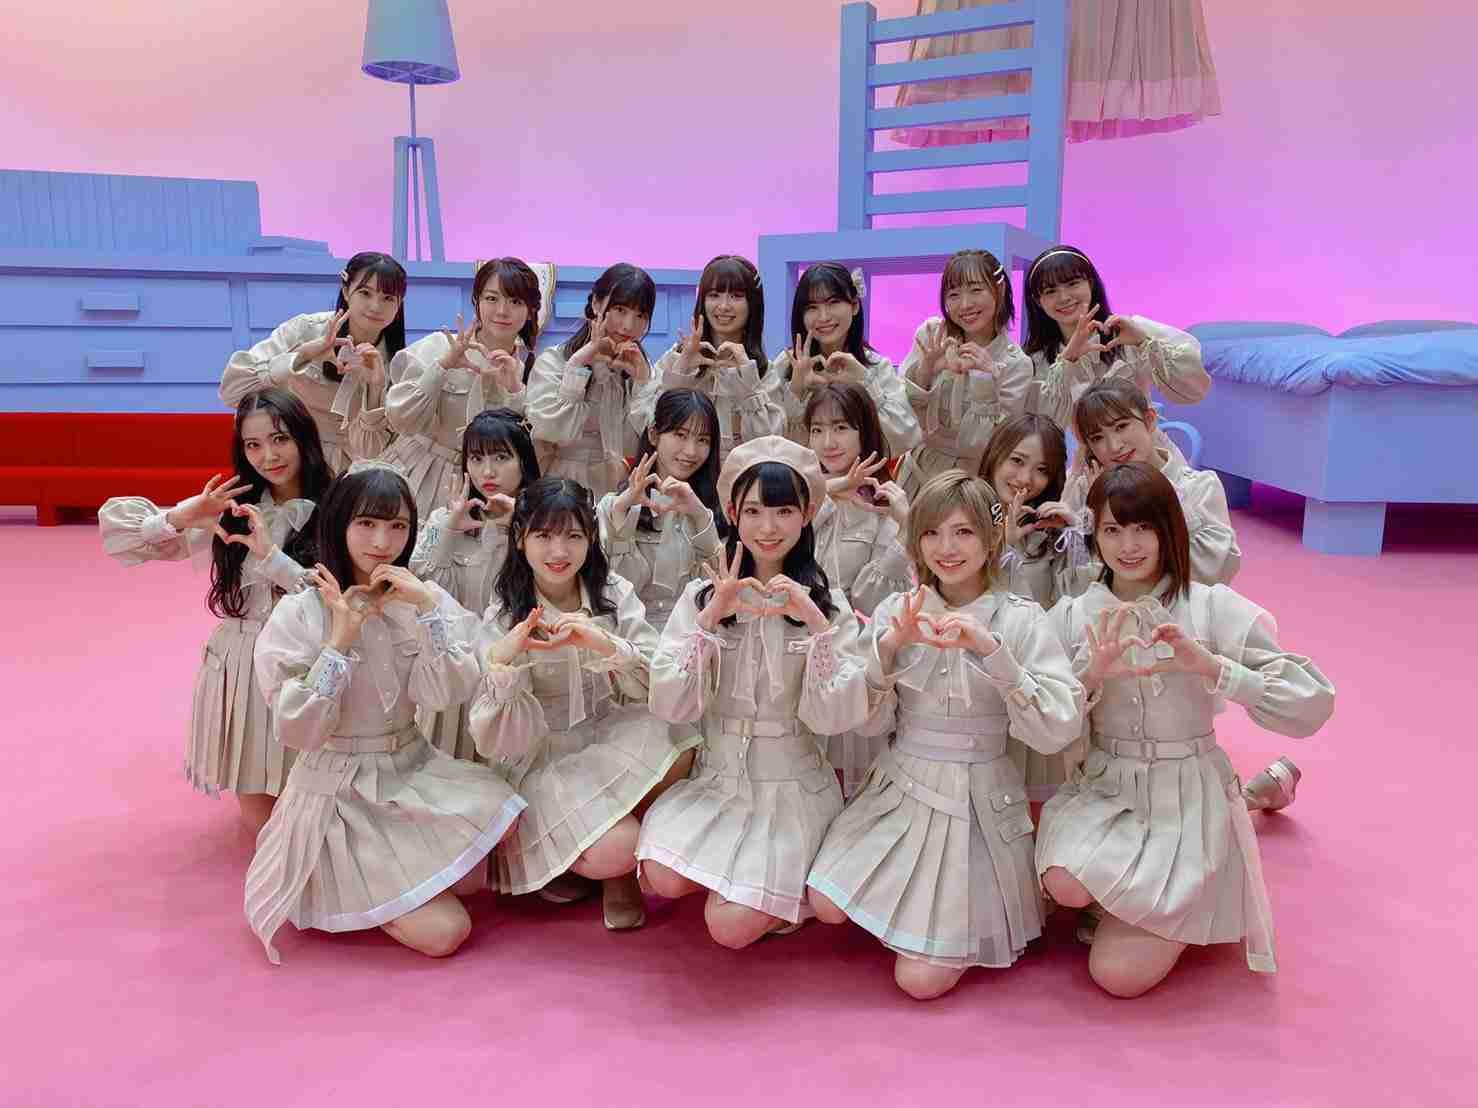 Total Penjualan Shitsuren Arigatou Single ke-57 AKB48